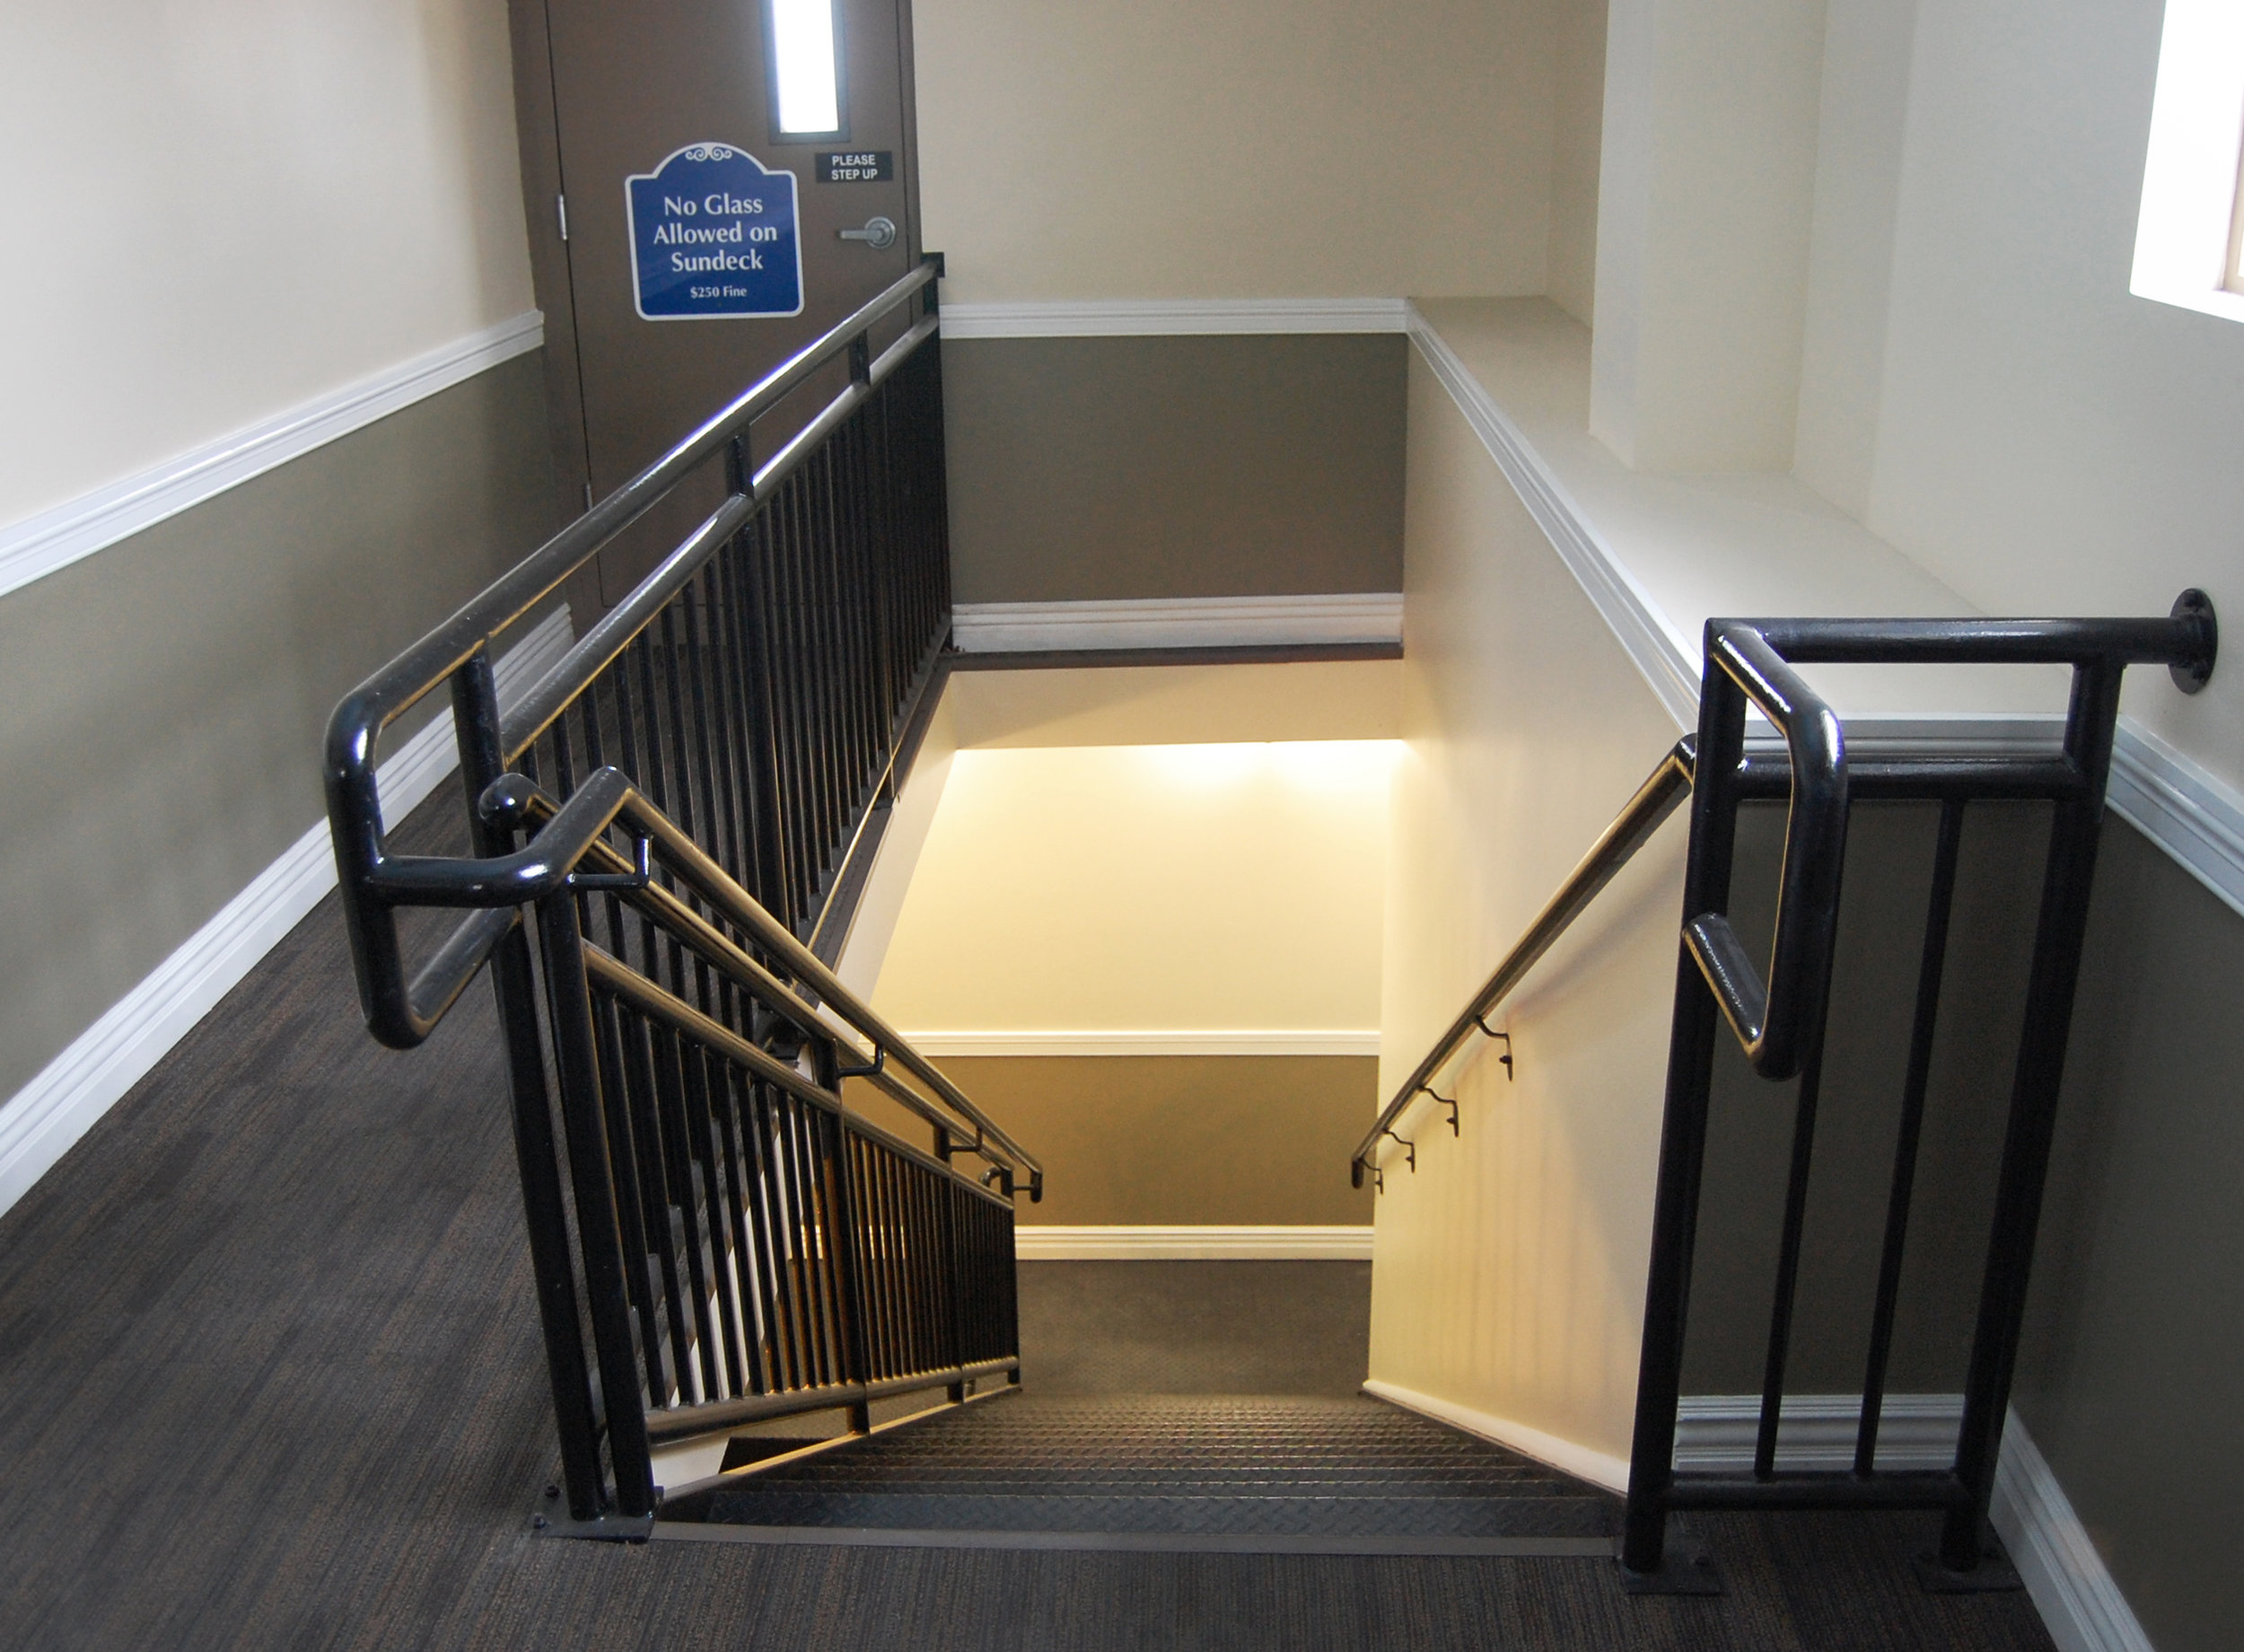 interior high-rise stairway